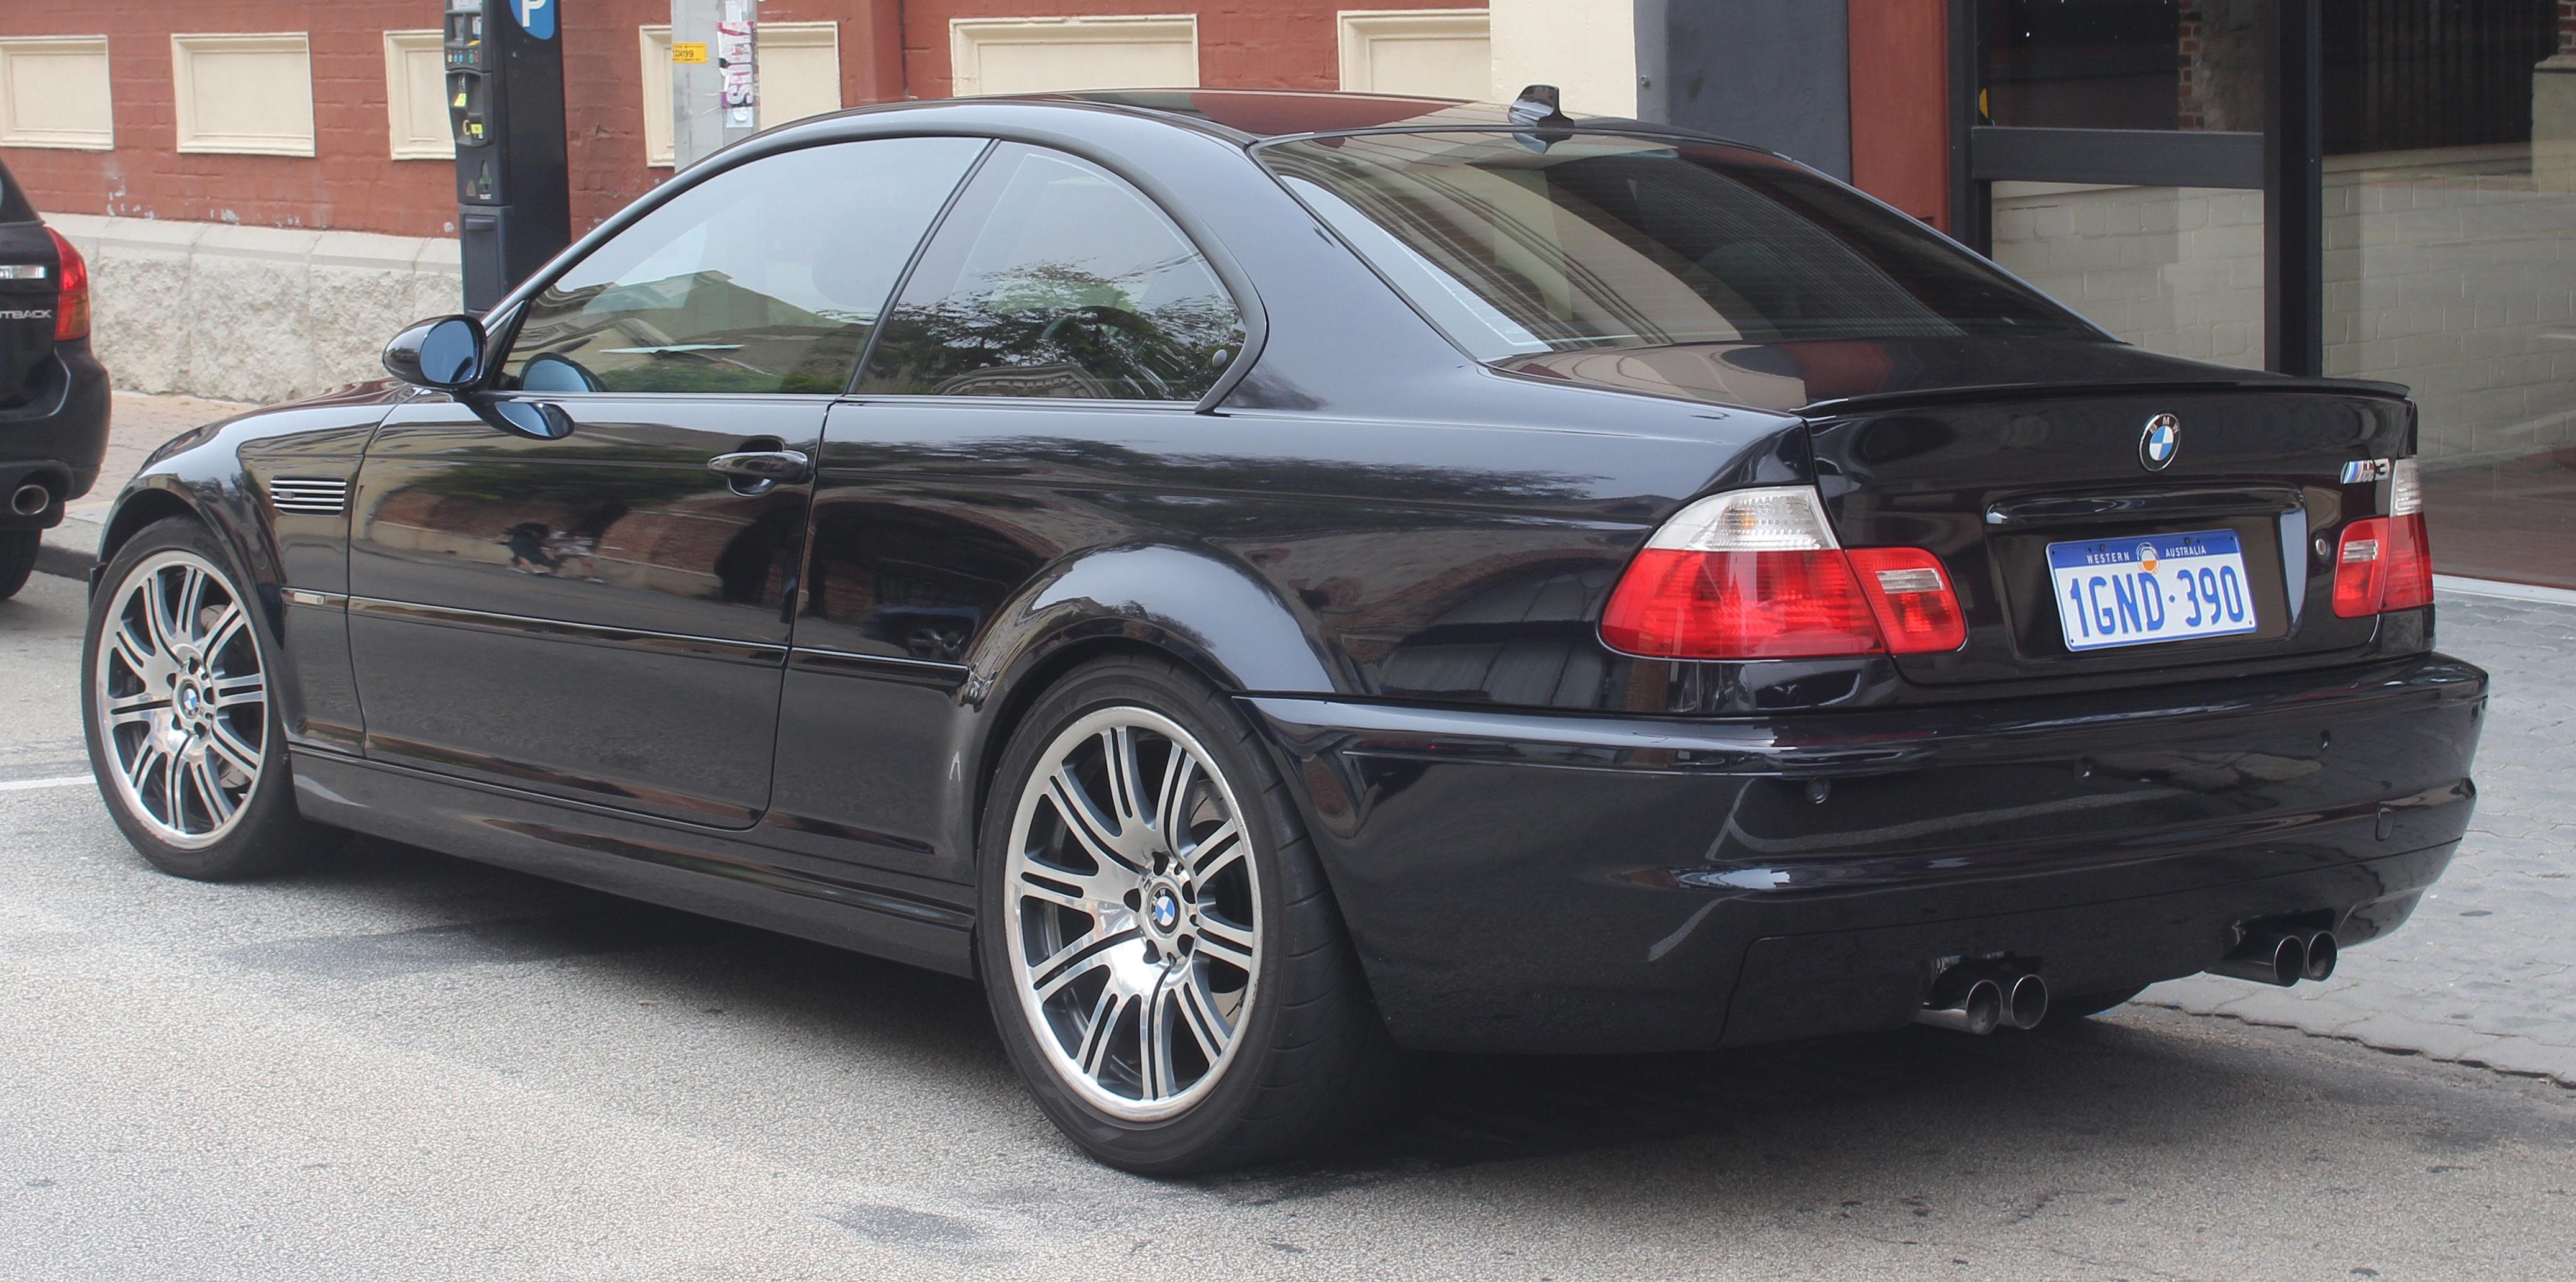 File 2001 2006 Bmw M3 E46 Coupe 2018 11 02 02 Jpg Wikimedia